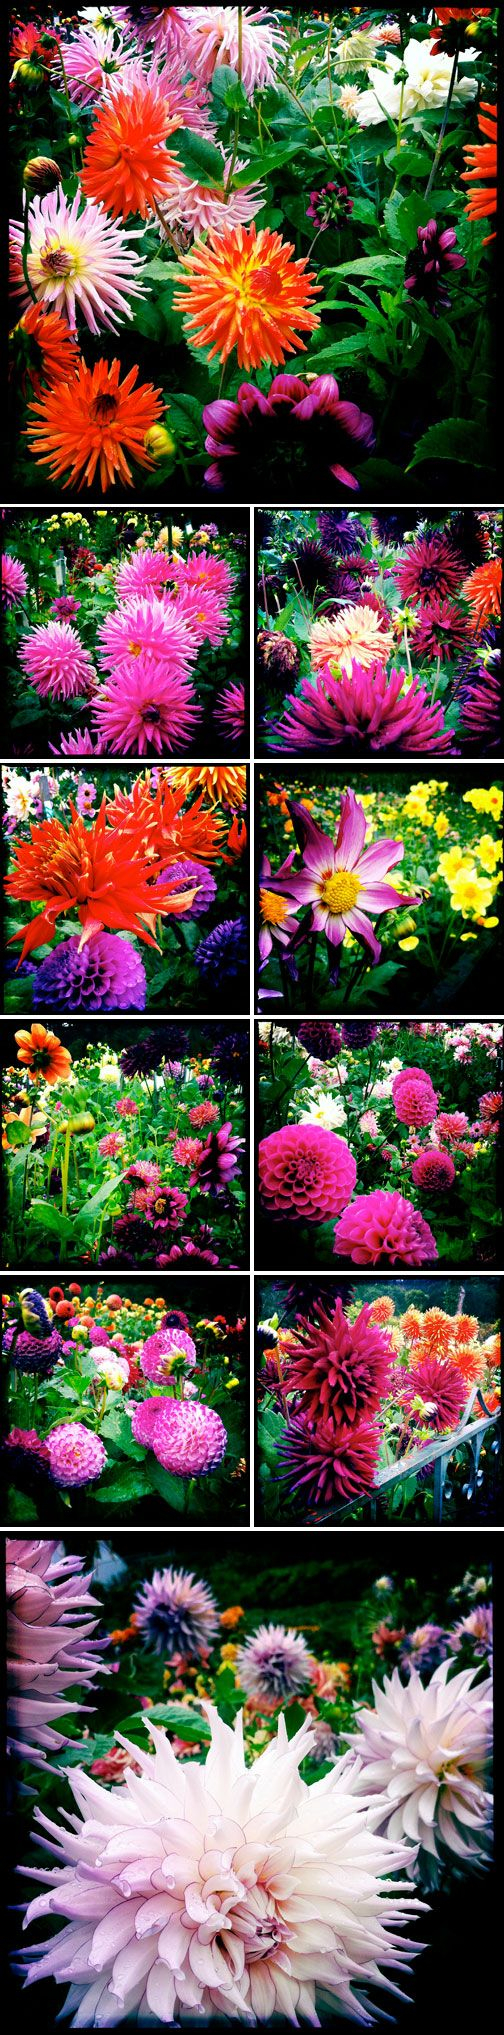 best flowers images on pinterest flowers garden cut flowers